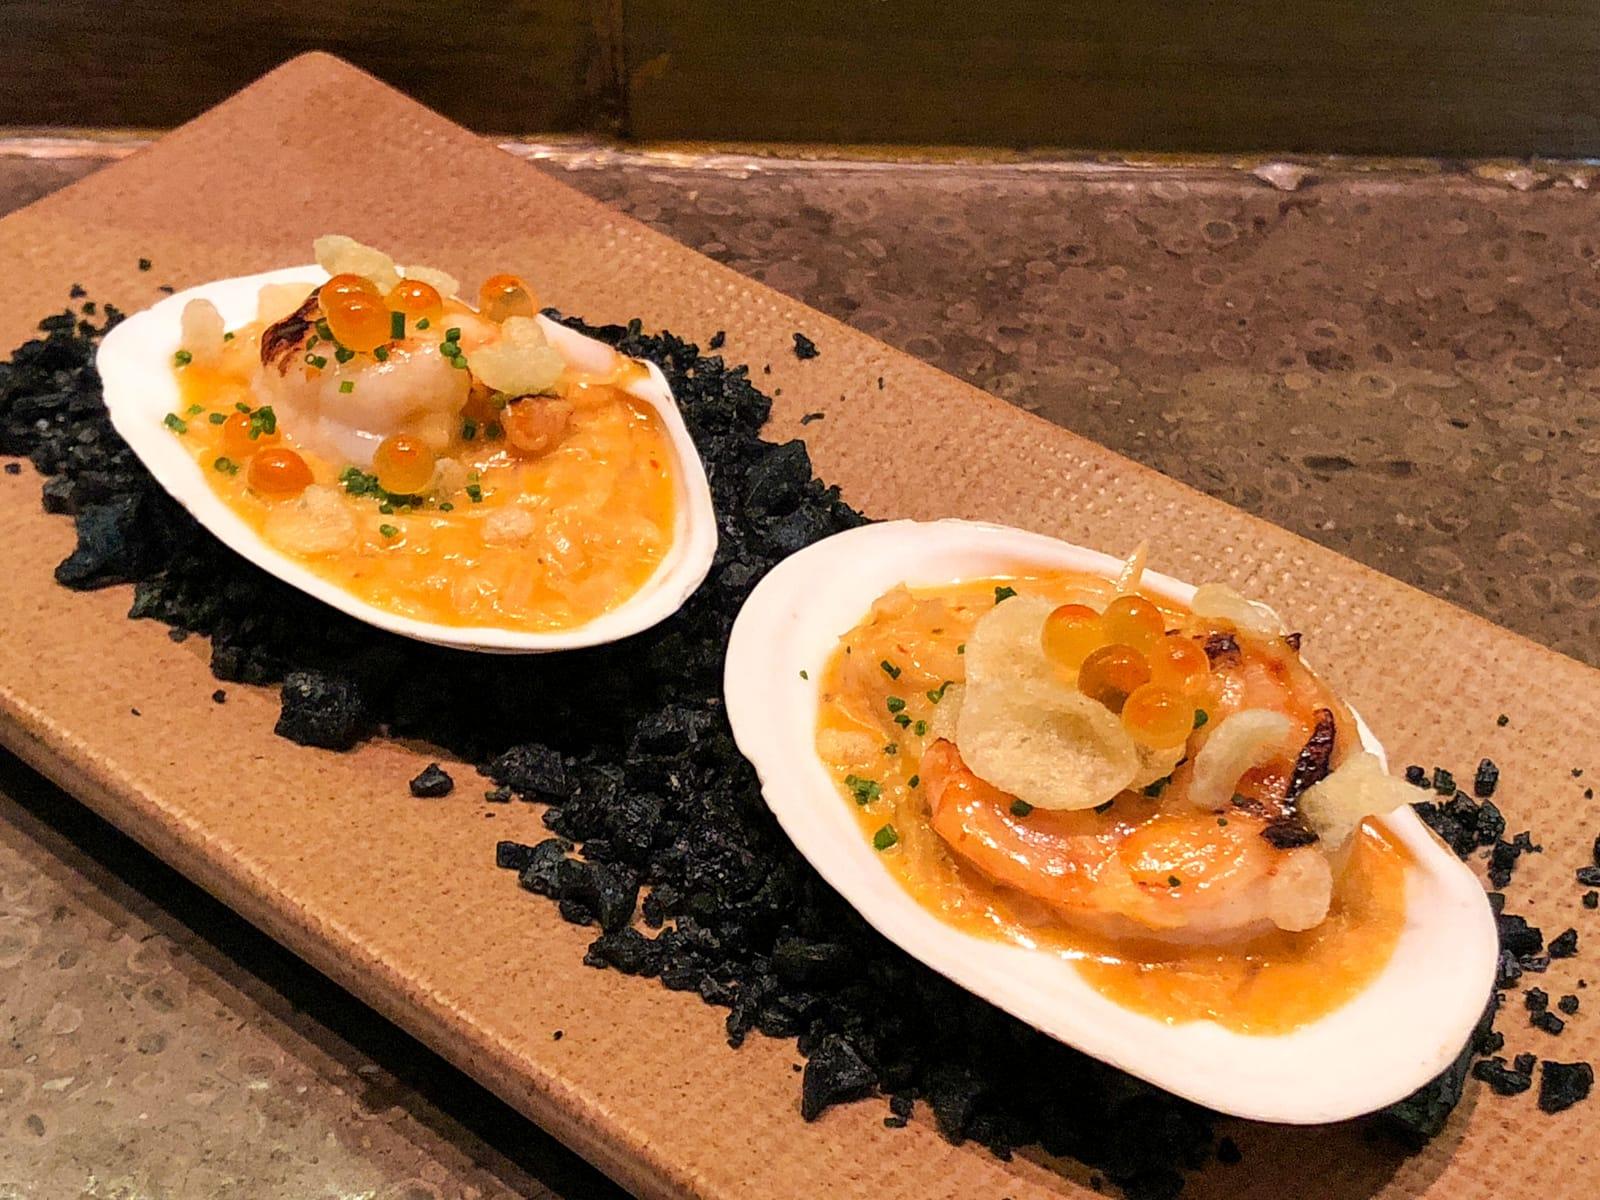 Grilled shrimp, leek, red curry